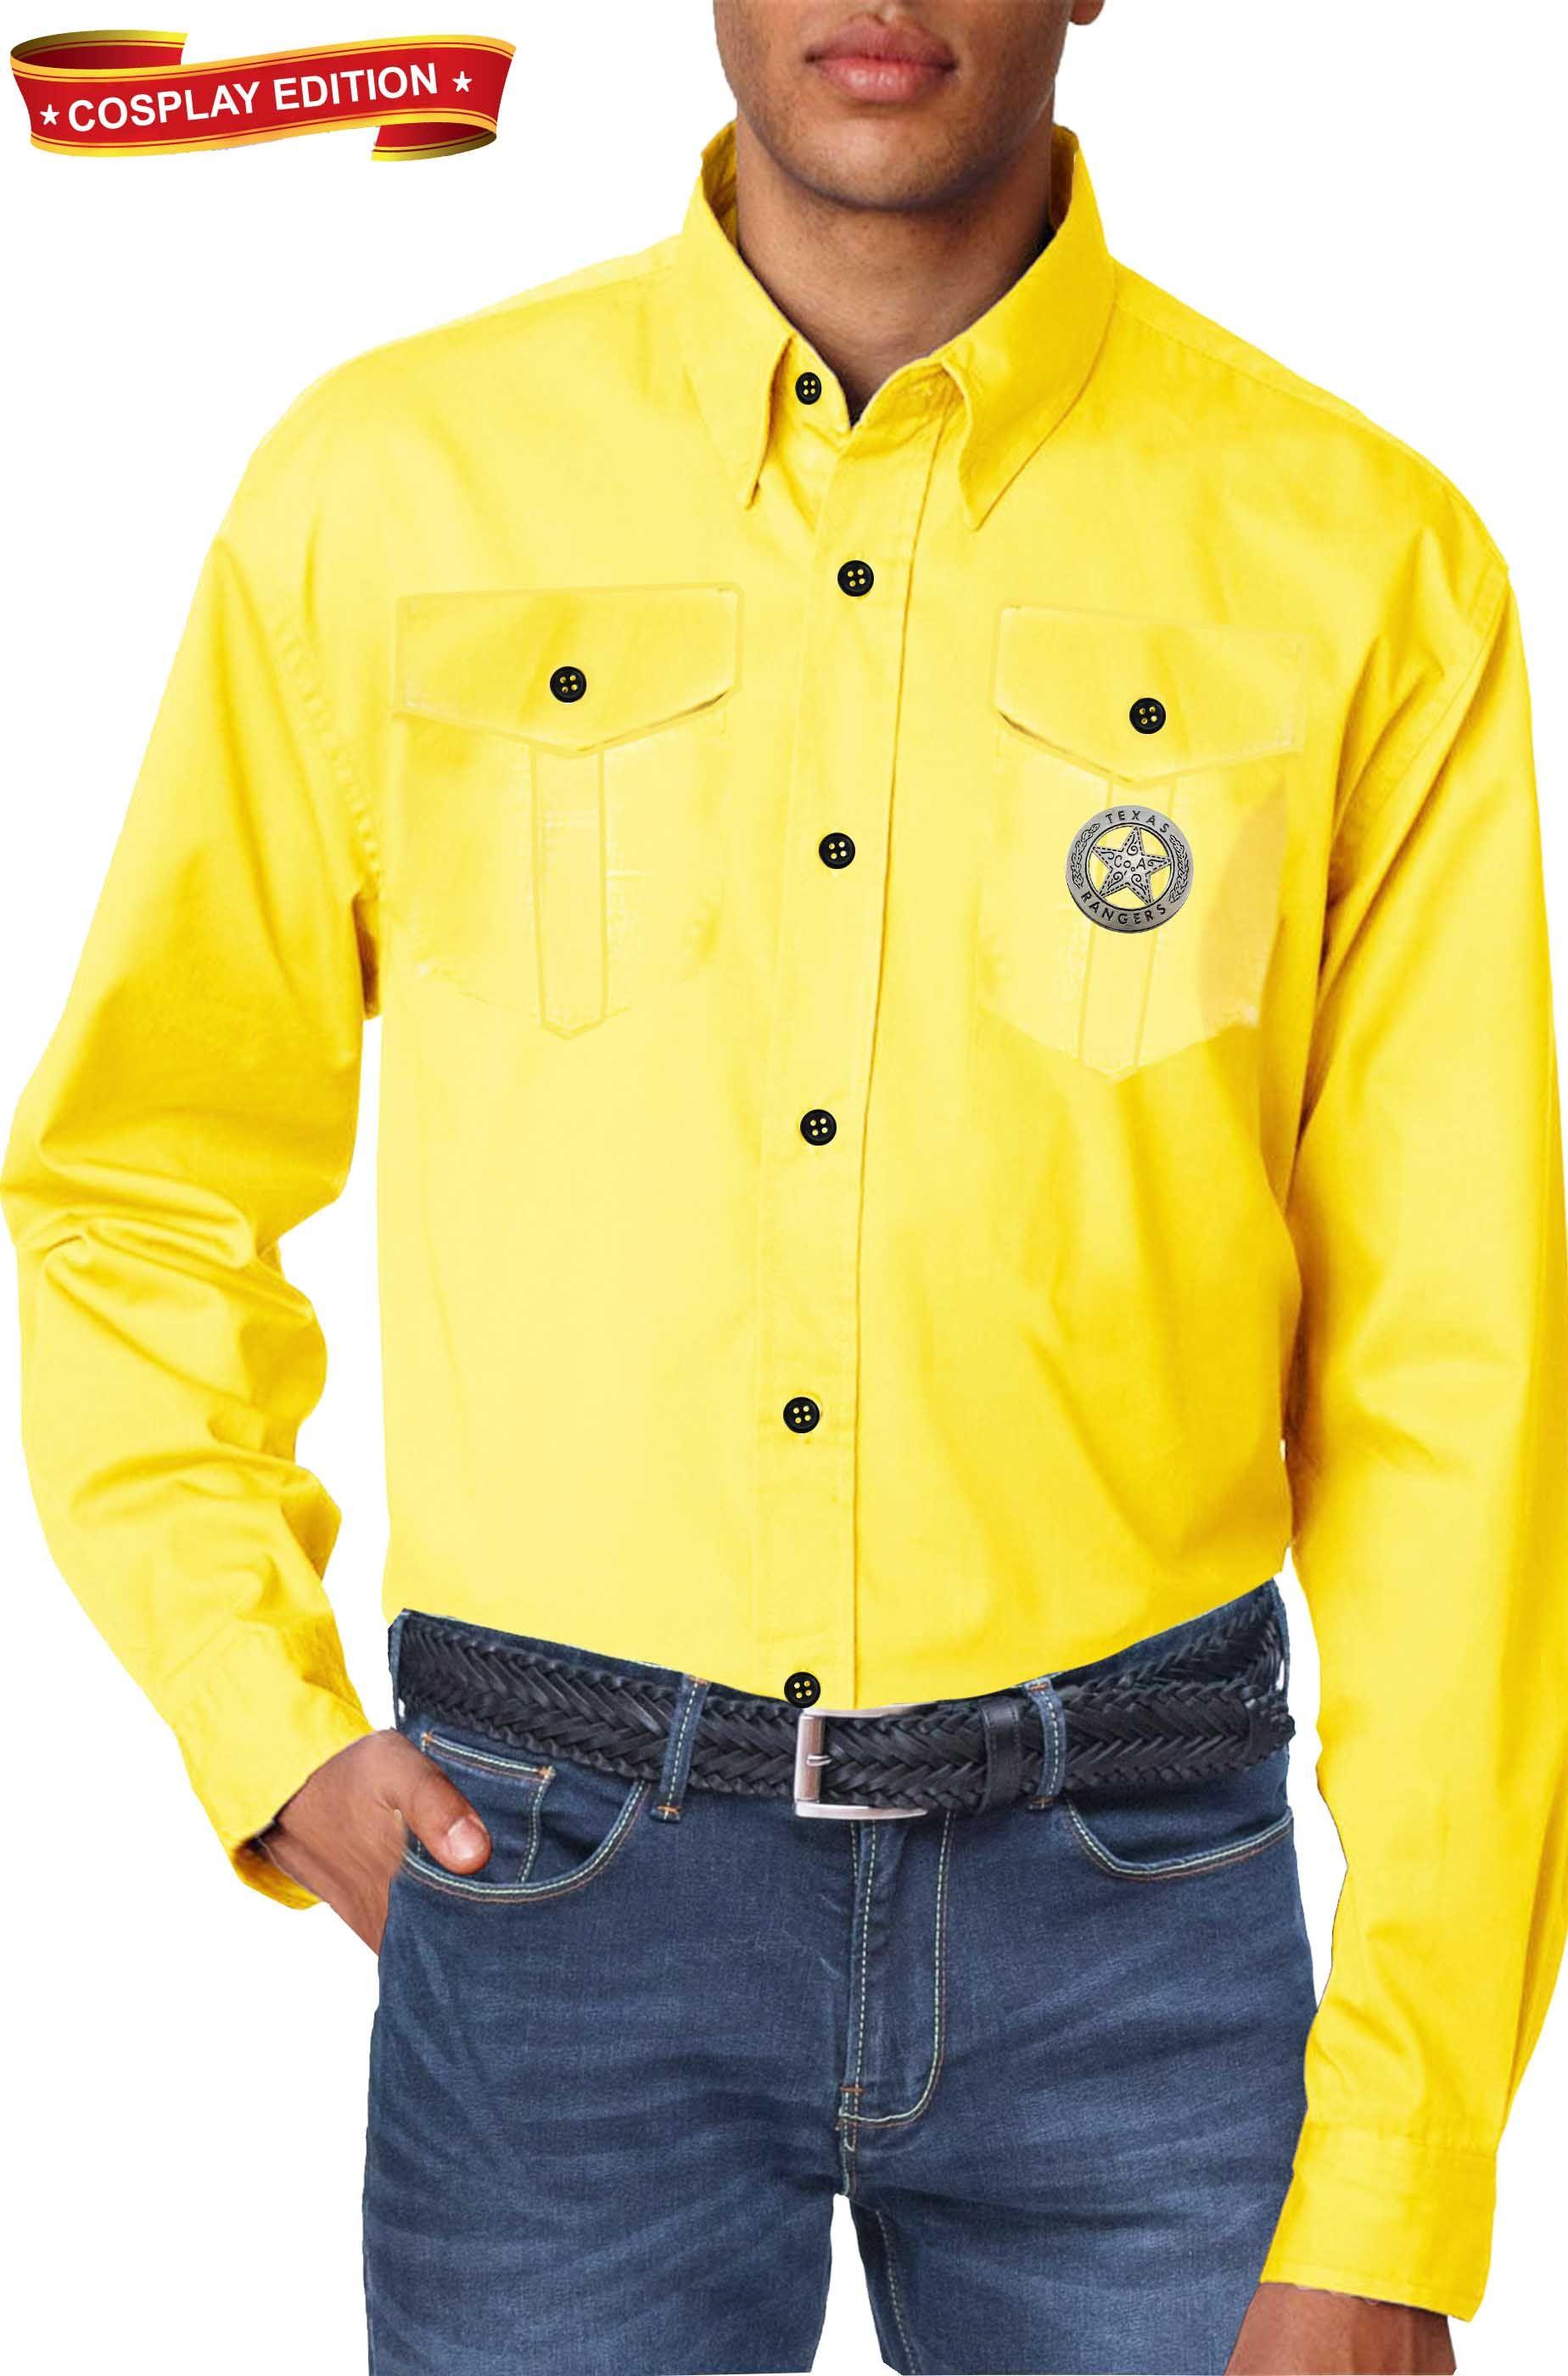 free shipping 73f64 ddc02 Camicia gialla replica Tex Willer con spilla Texas Rangers